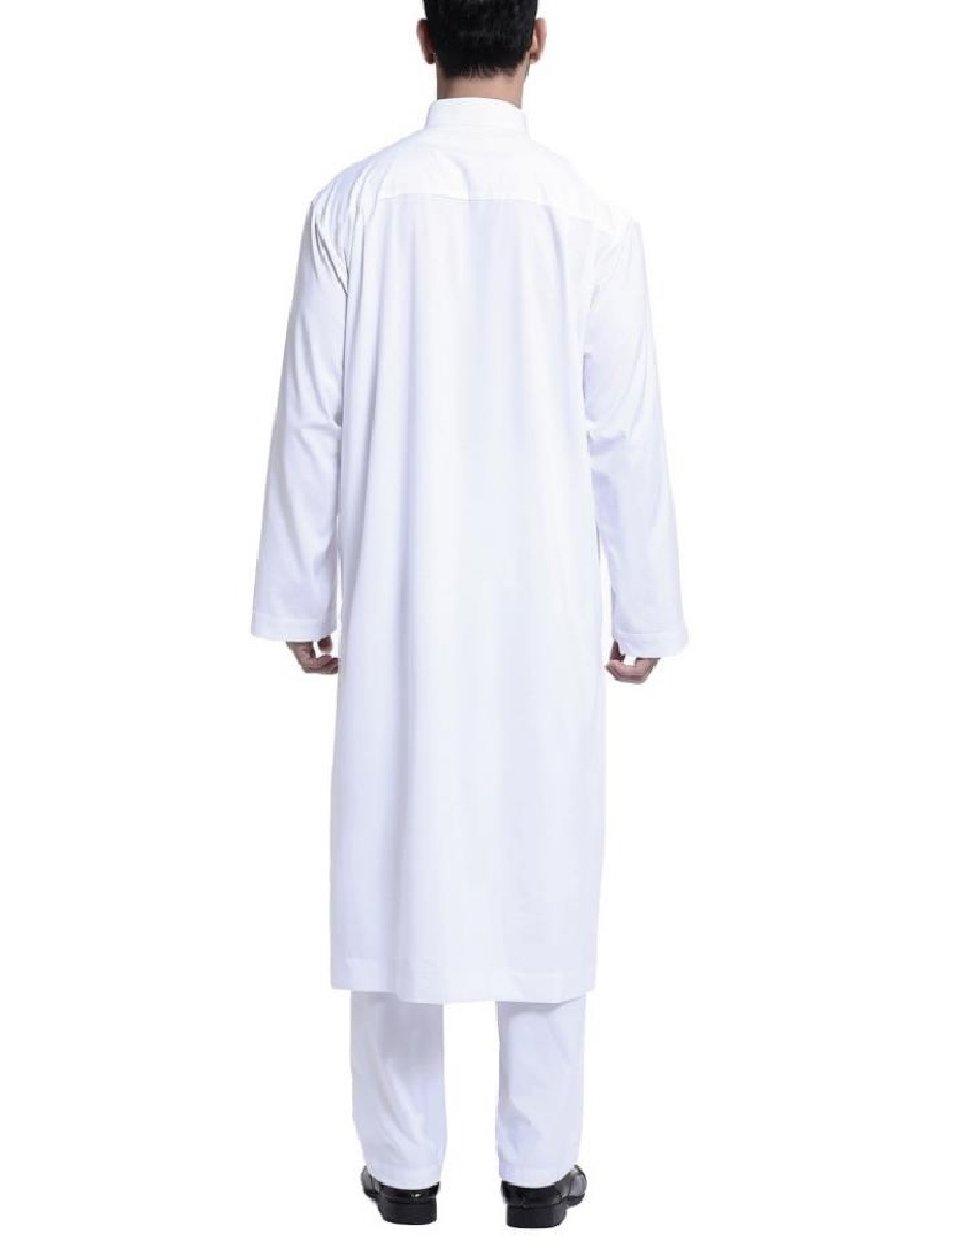 Winwinus Men Middle East Islamic Saudi Arabia Muslim Salwar Suit Sets White L by Winwinus (Image #2)